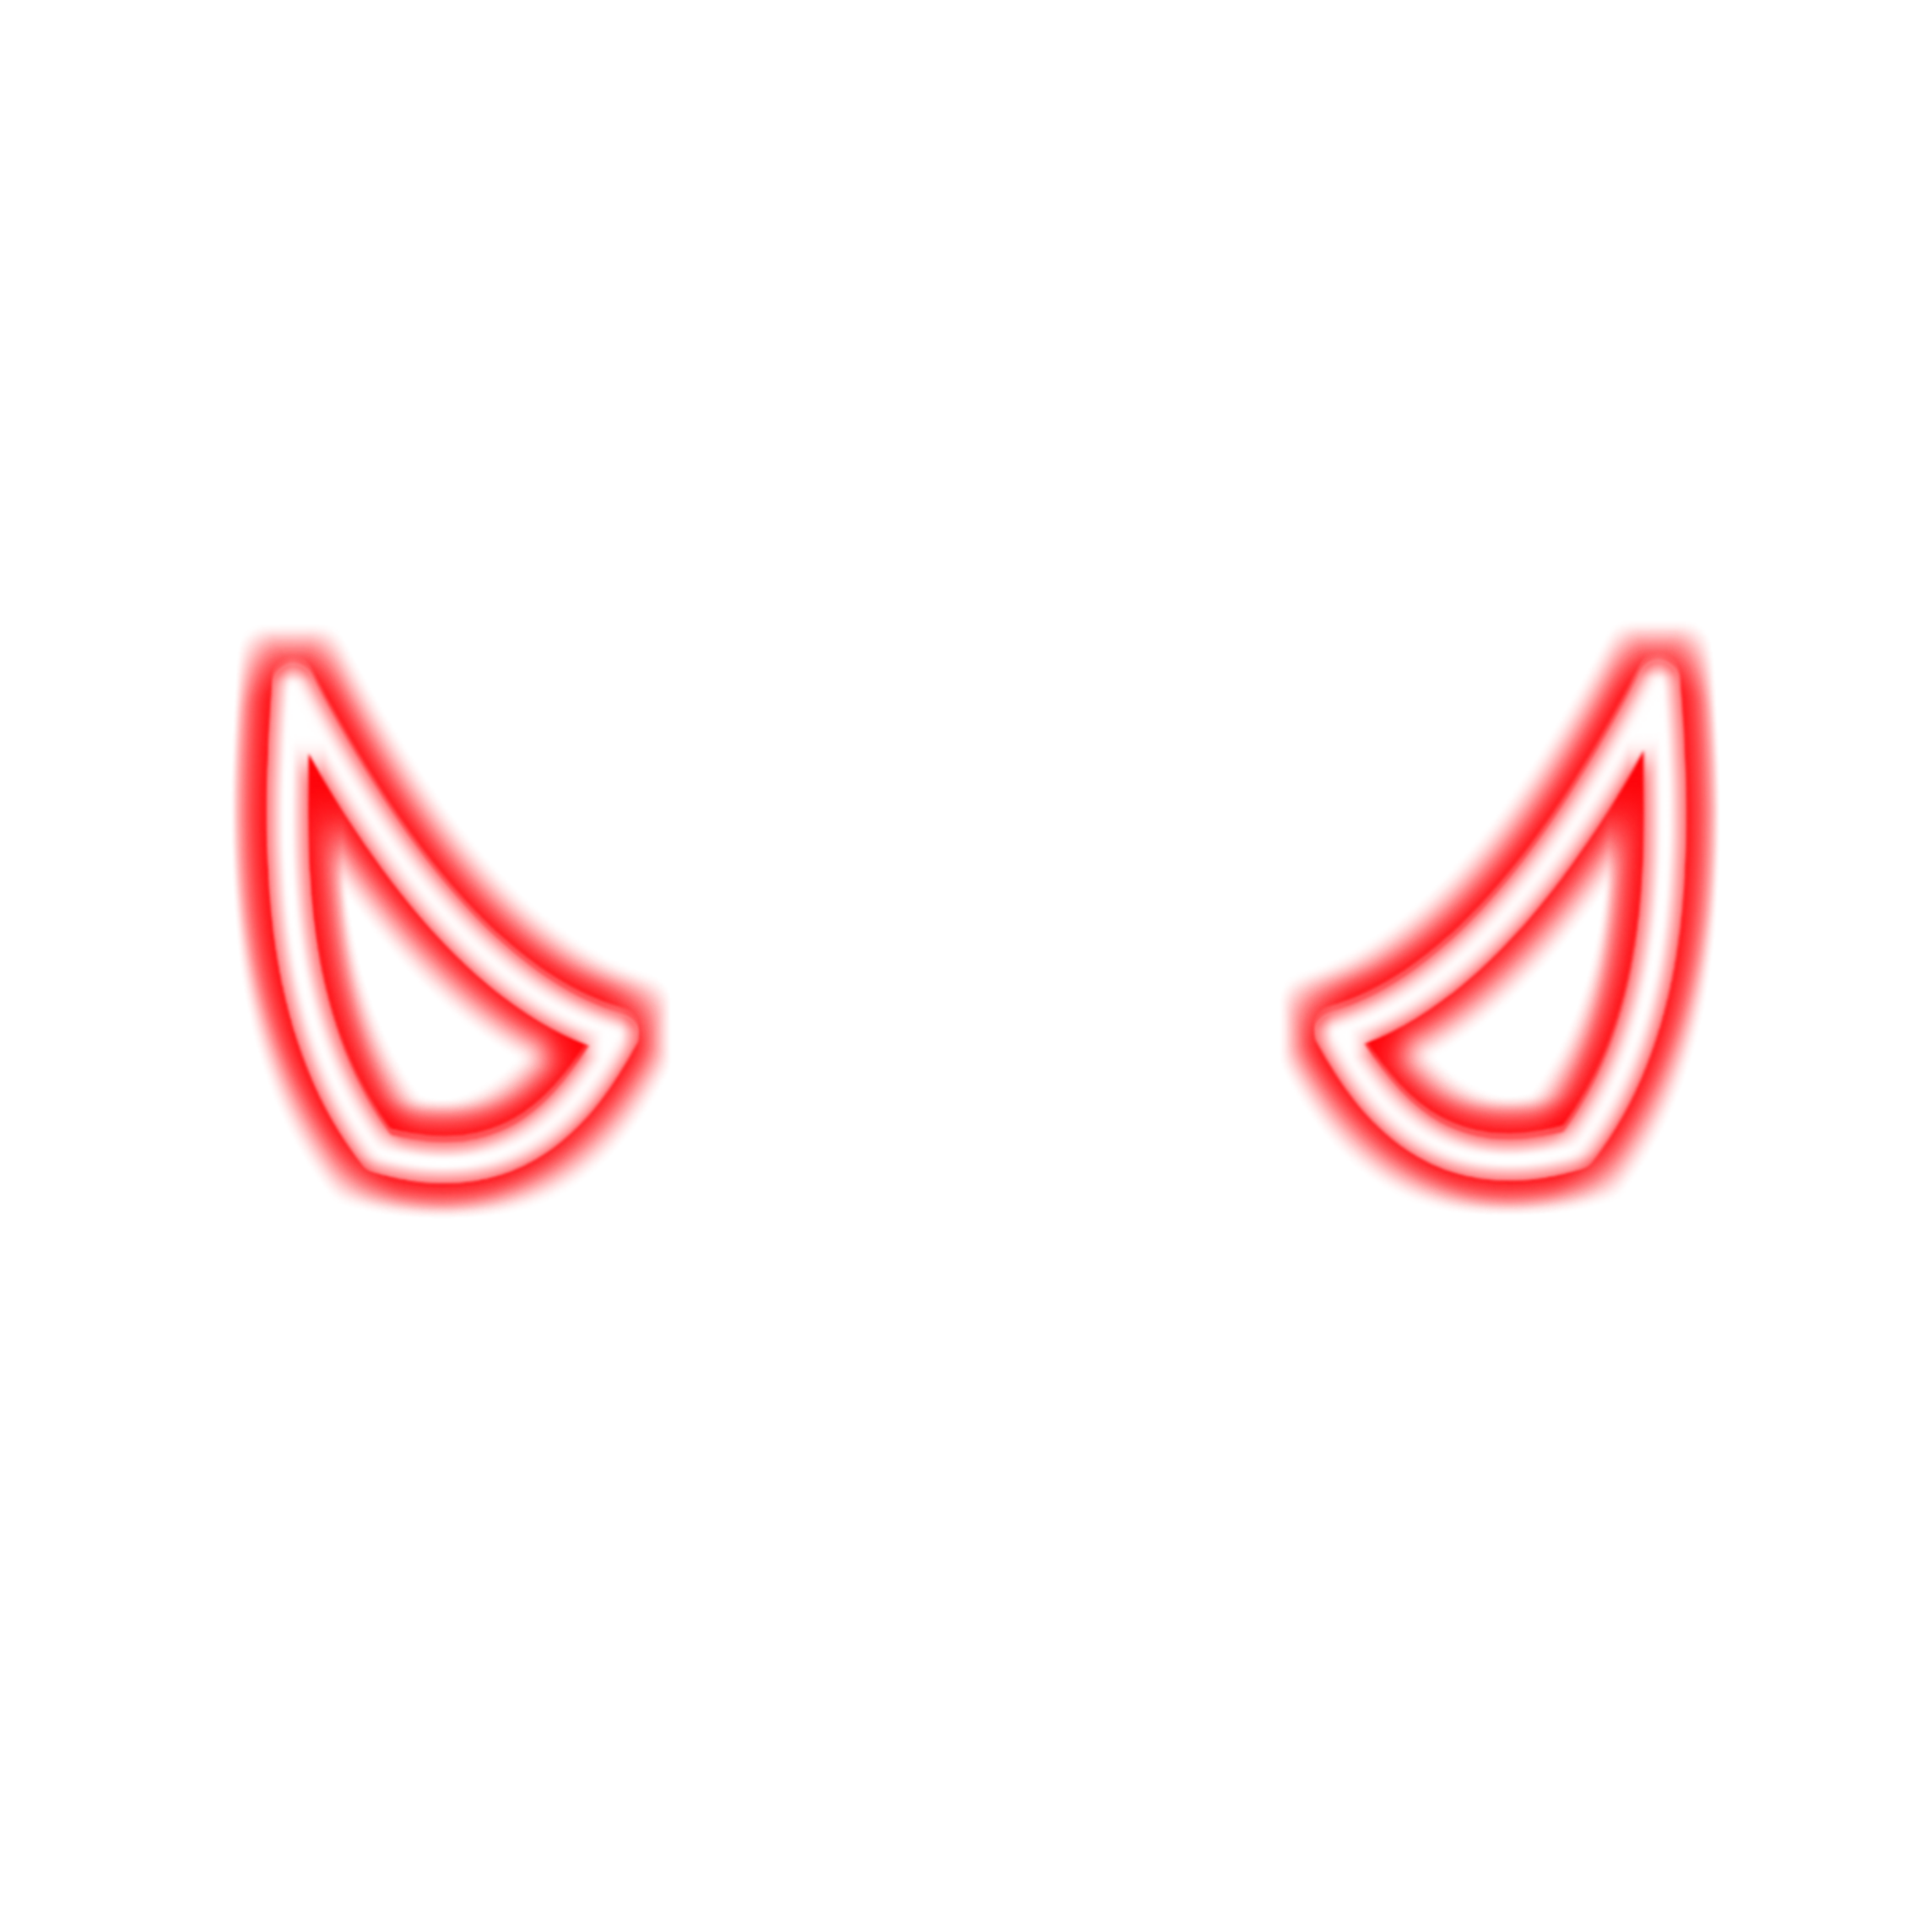 Evilheartcrownheartcrown Demon Sticker By 𓆉ƙ ̇ɳɠ𓆉